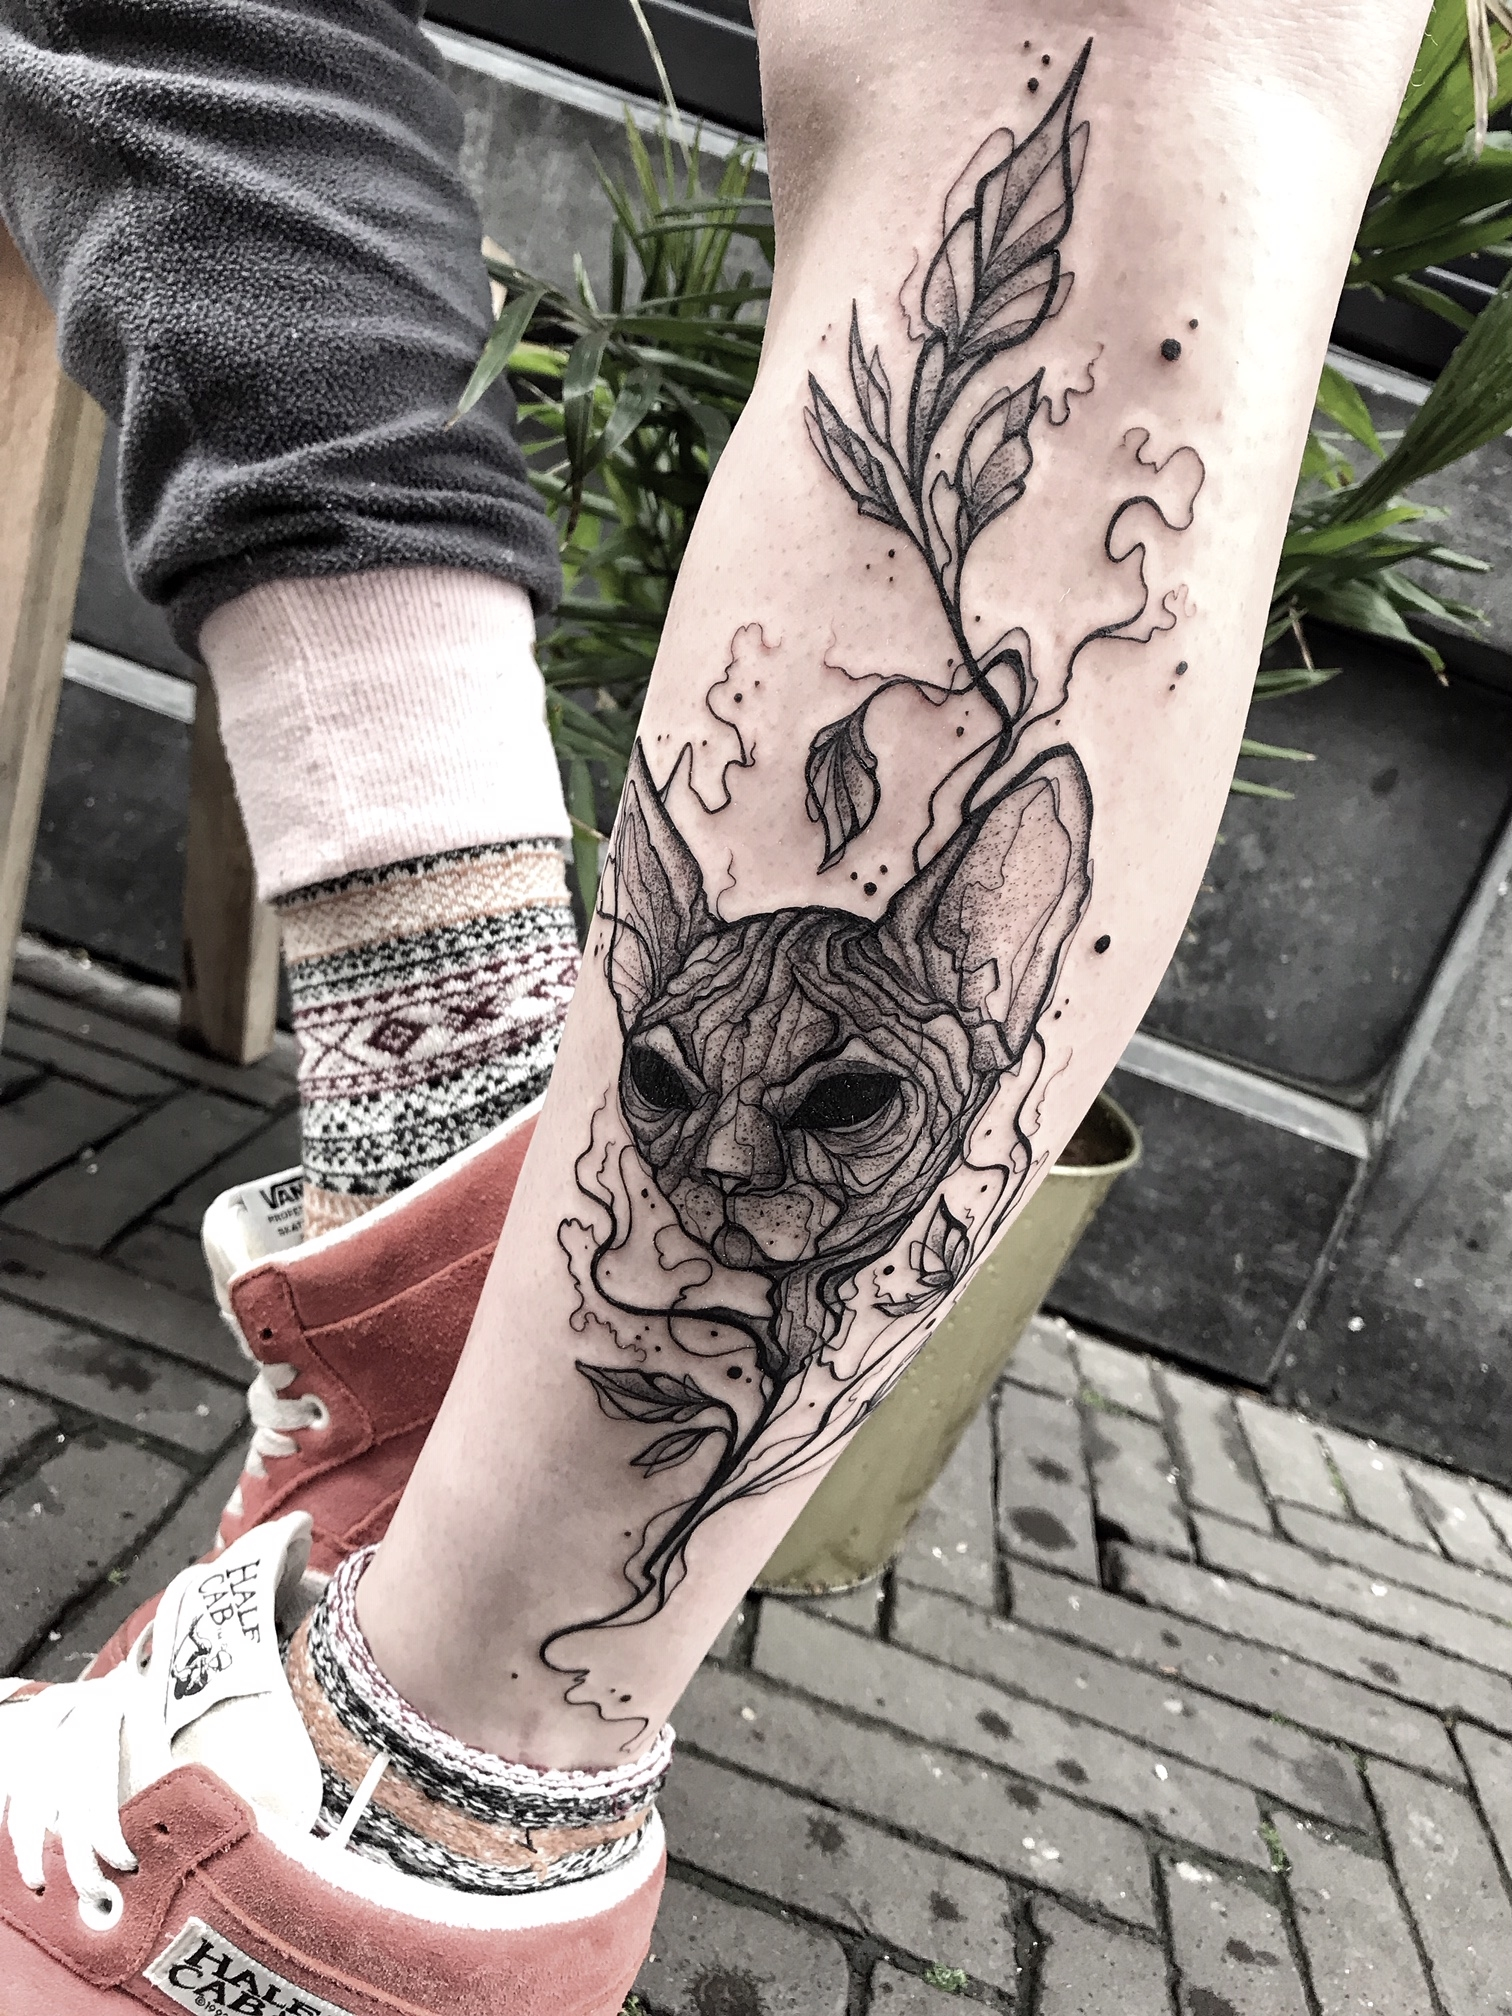 Inksearch tattoo wolespac